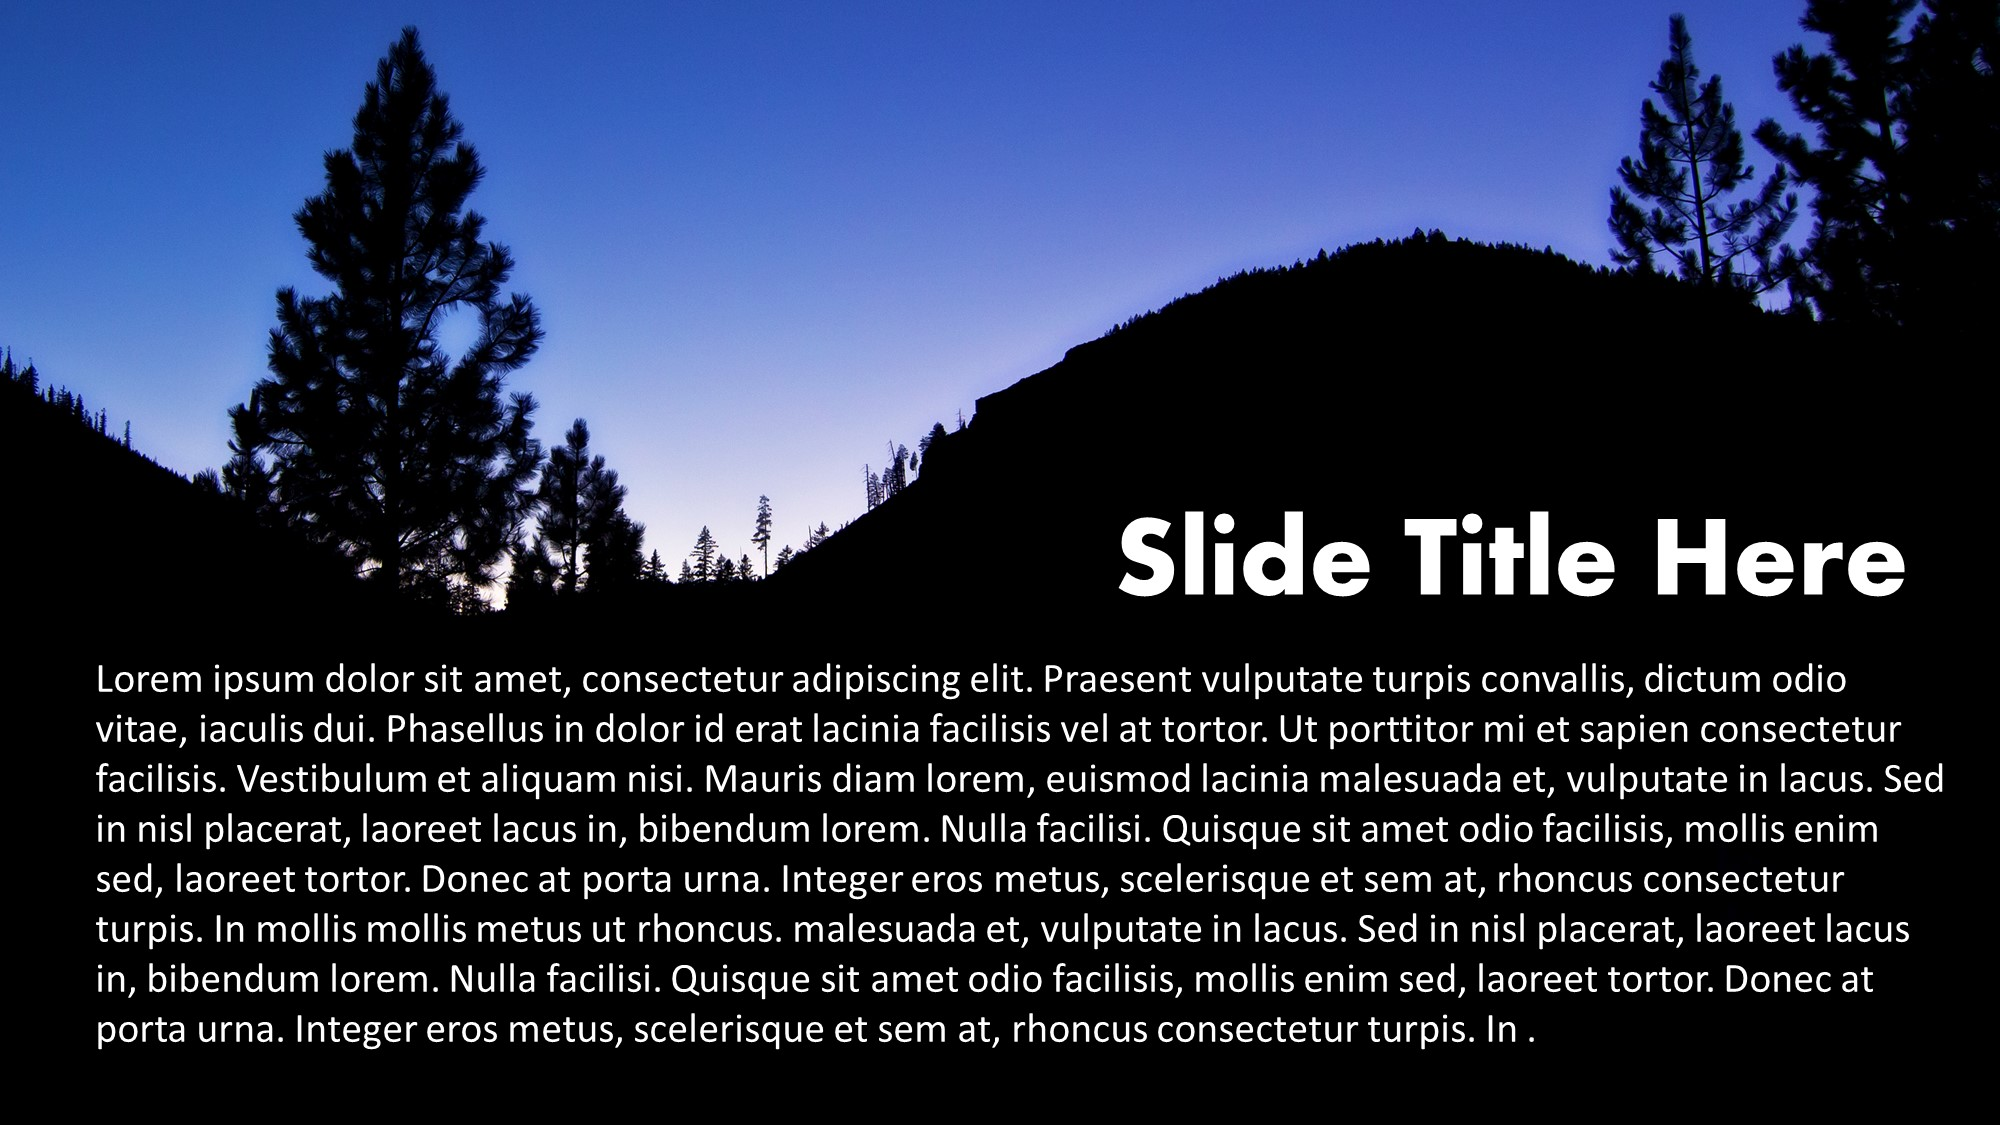 Silhoutte evening slide